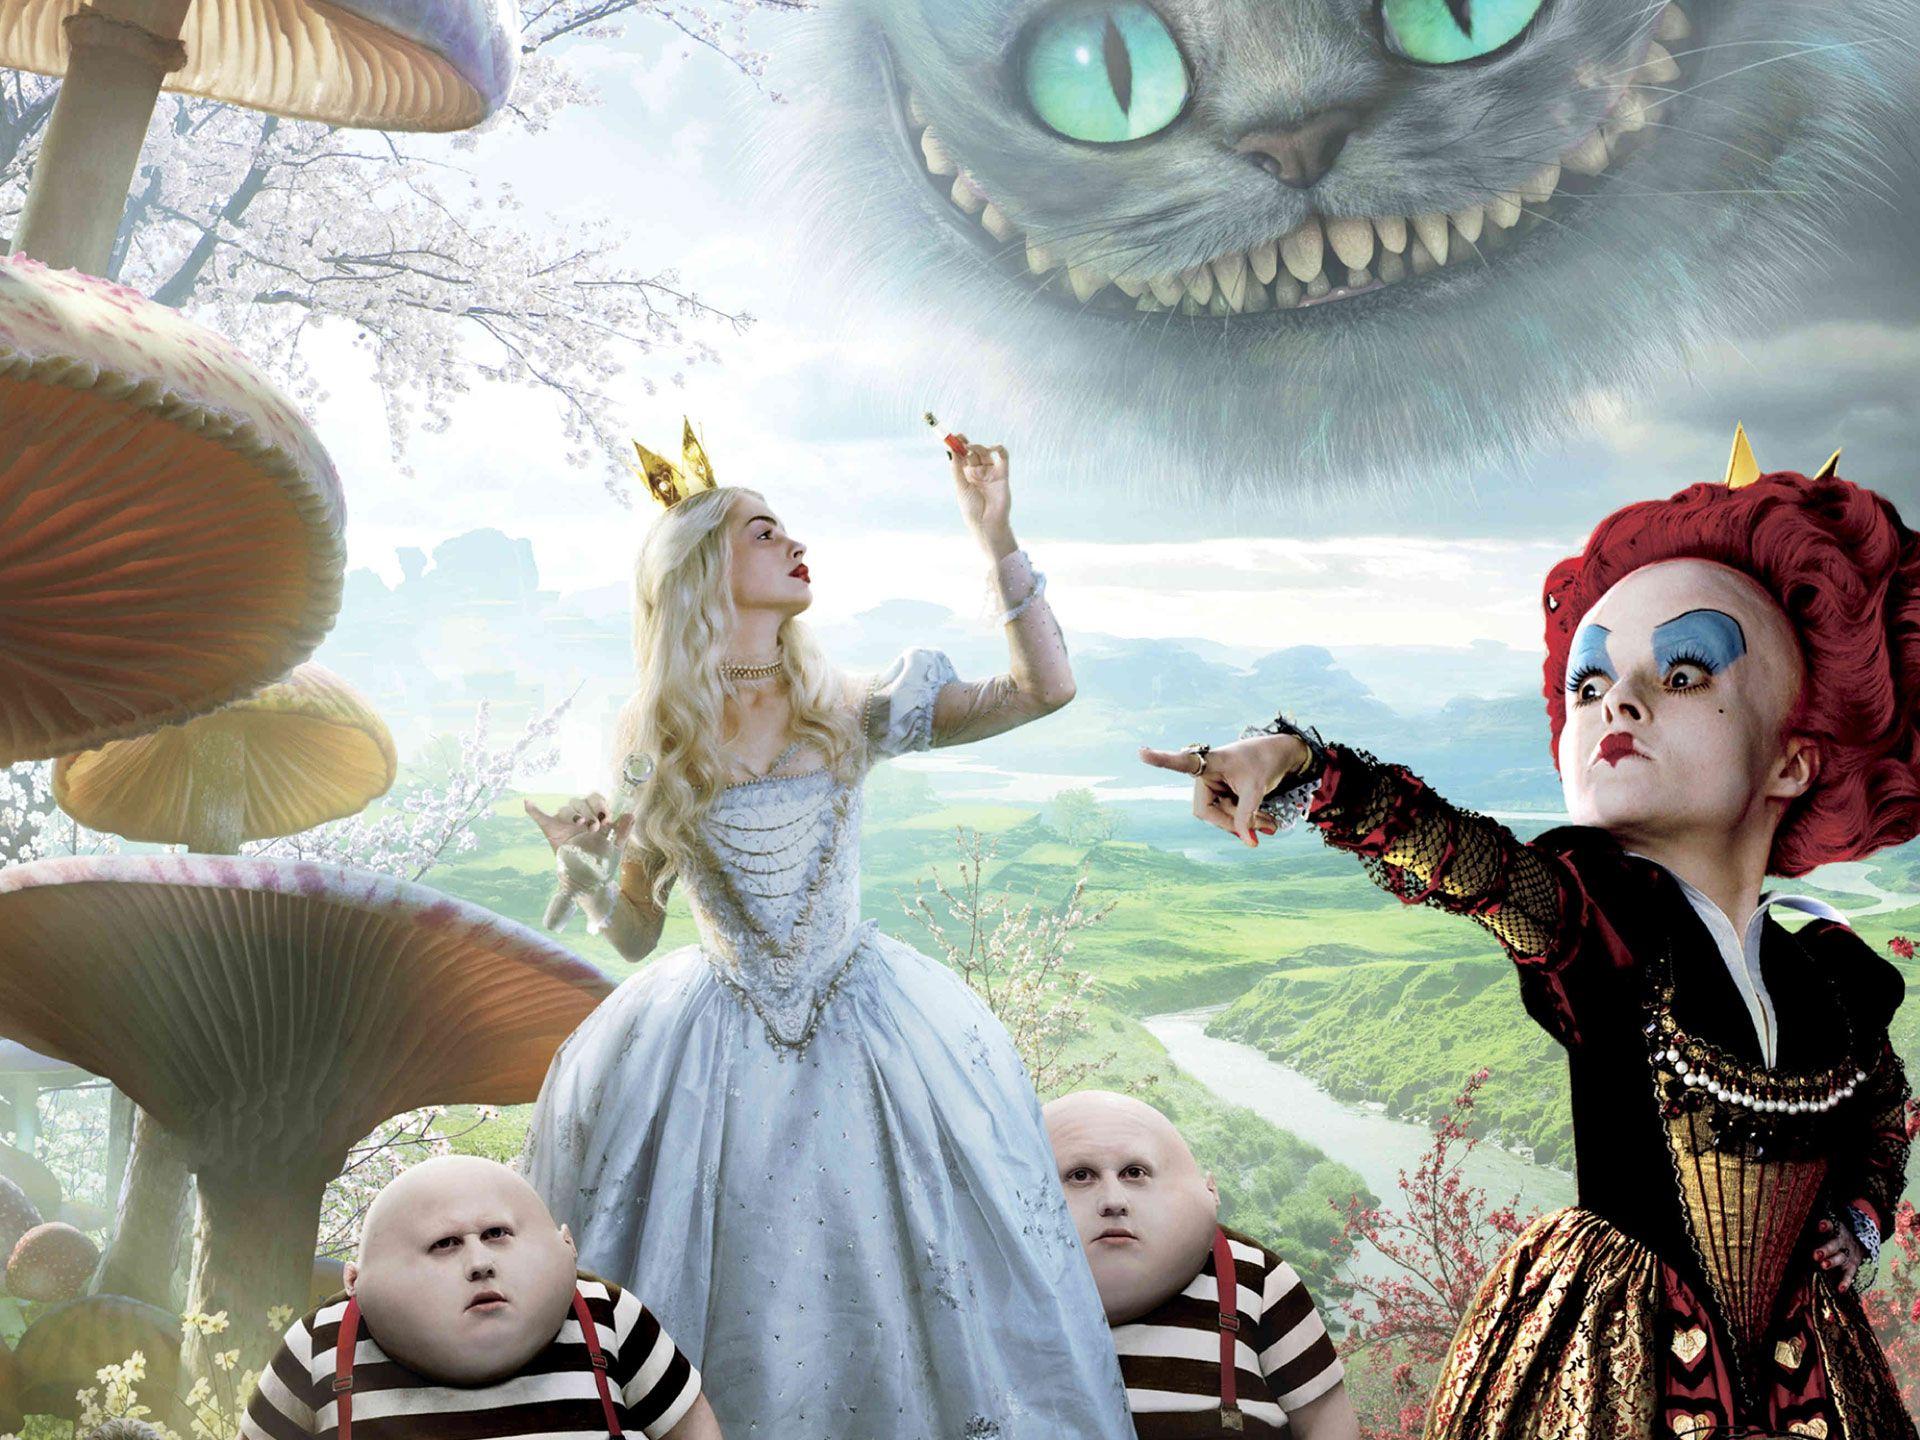 Crazy Alice In Wonderland Pics Eurekanos Alice In Wonderland 2010 W Alice In Wonderland Cartoon Alice In Wonderland Characters Alice In Wonderland Poster